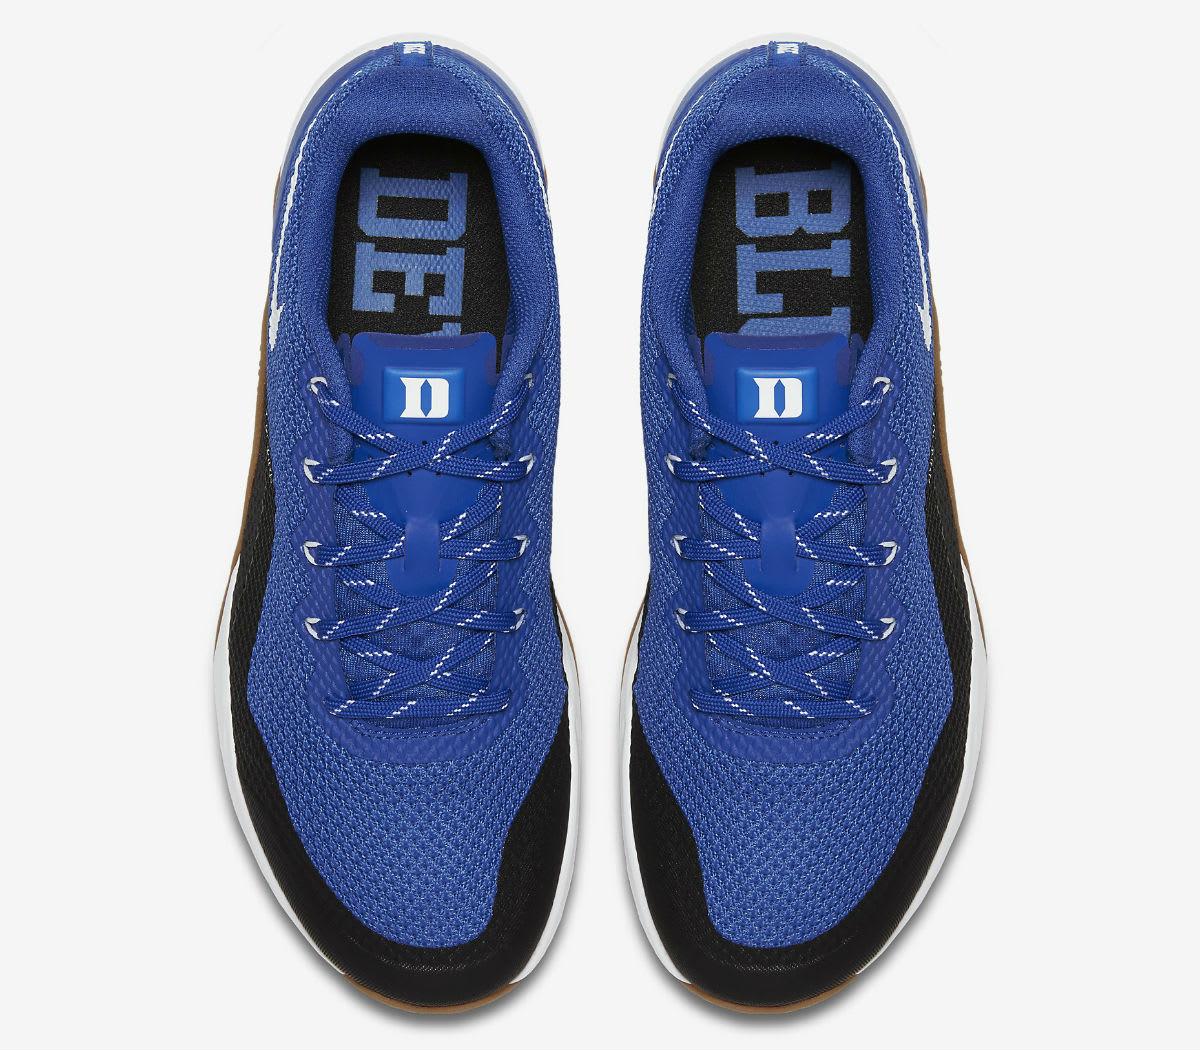 Nike Metcon Repper DSX Duke Release Date (2)